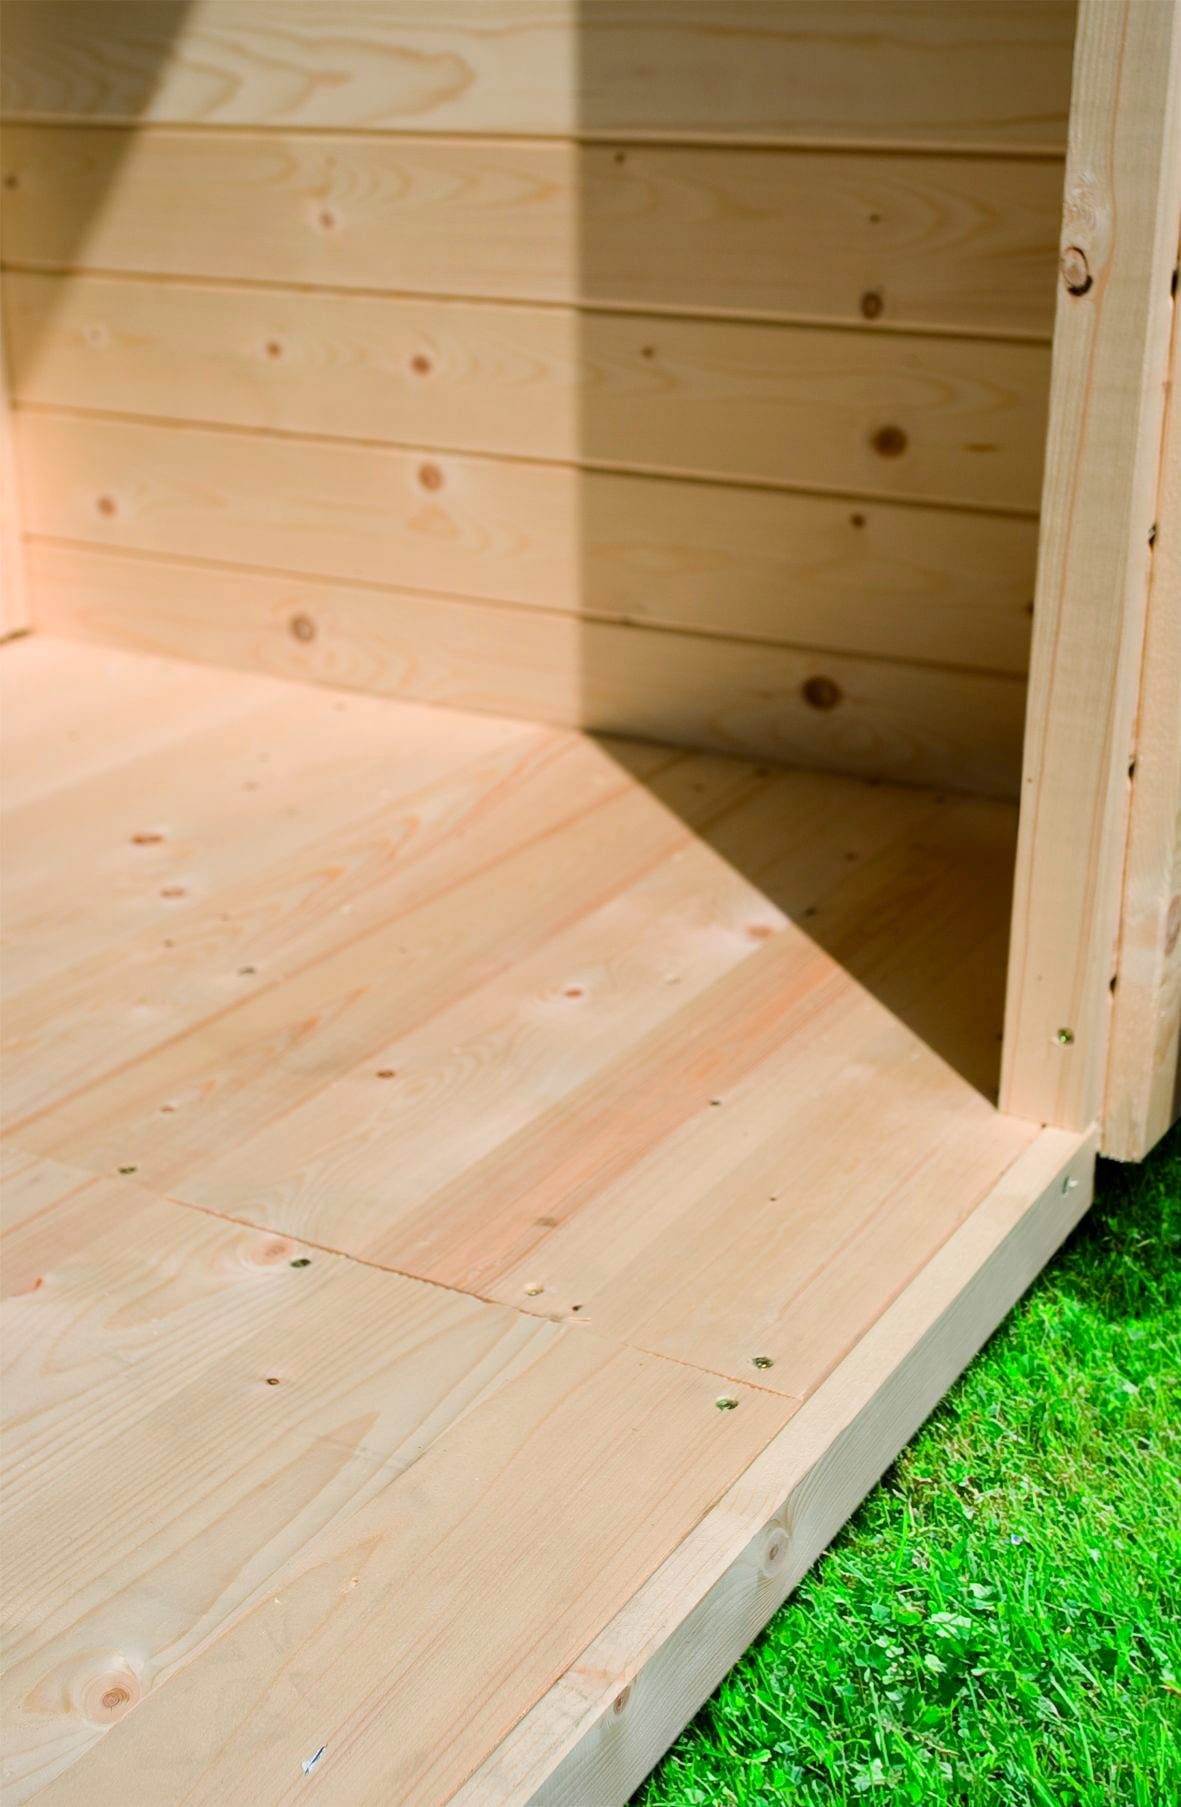 KARIBU Fußboden für Gartenhäuser »(BxT: 181 x 355 cm)«   Garten > Gartenhäuser   Natur   Naturbelassen - Holz   KARIBU